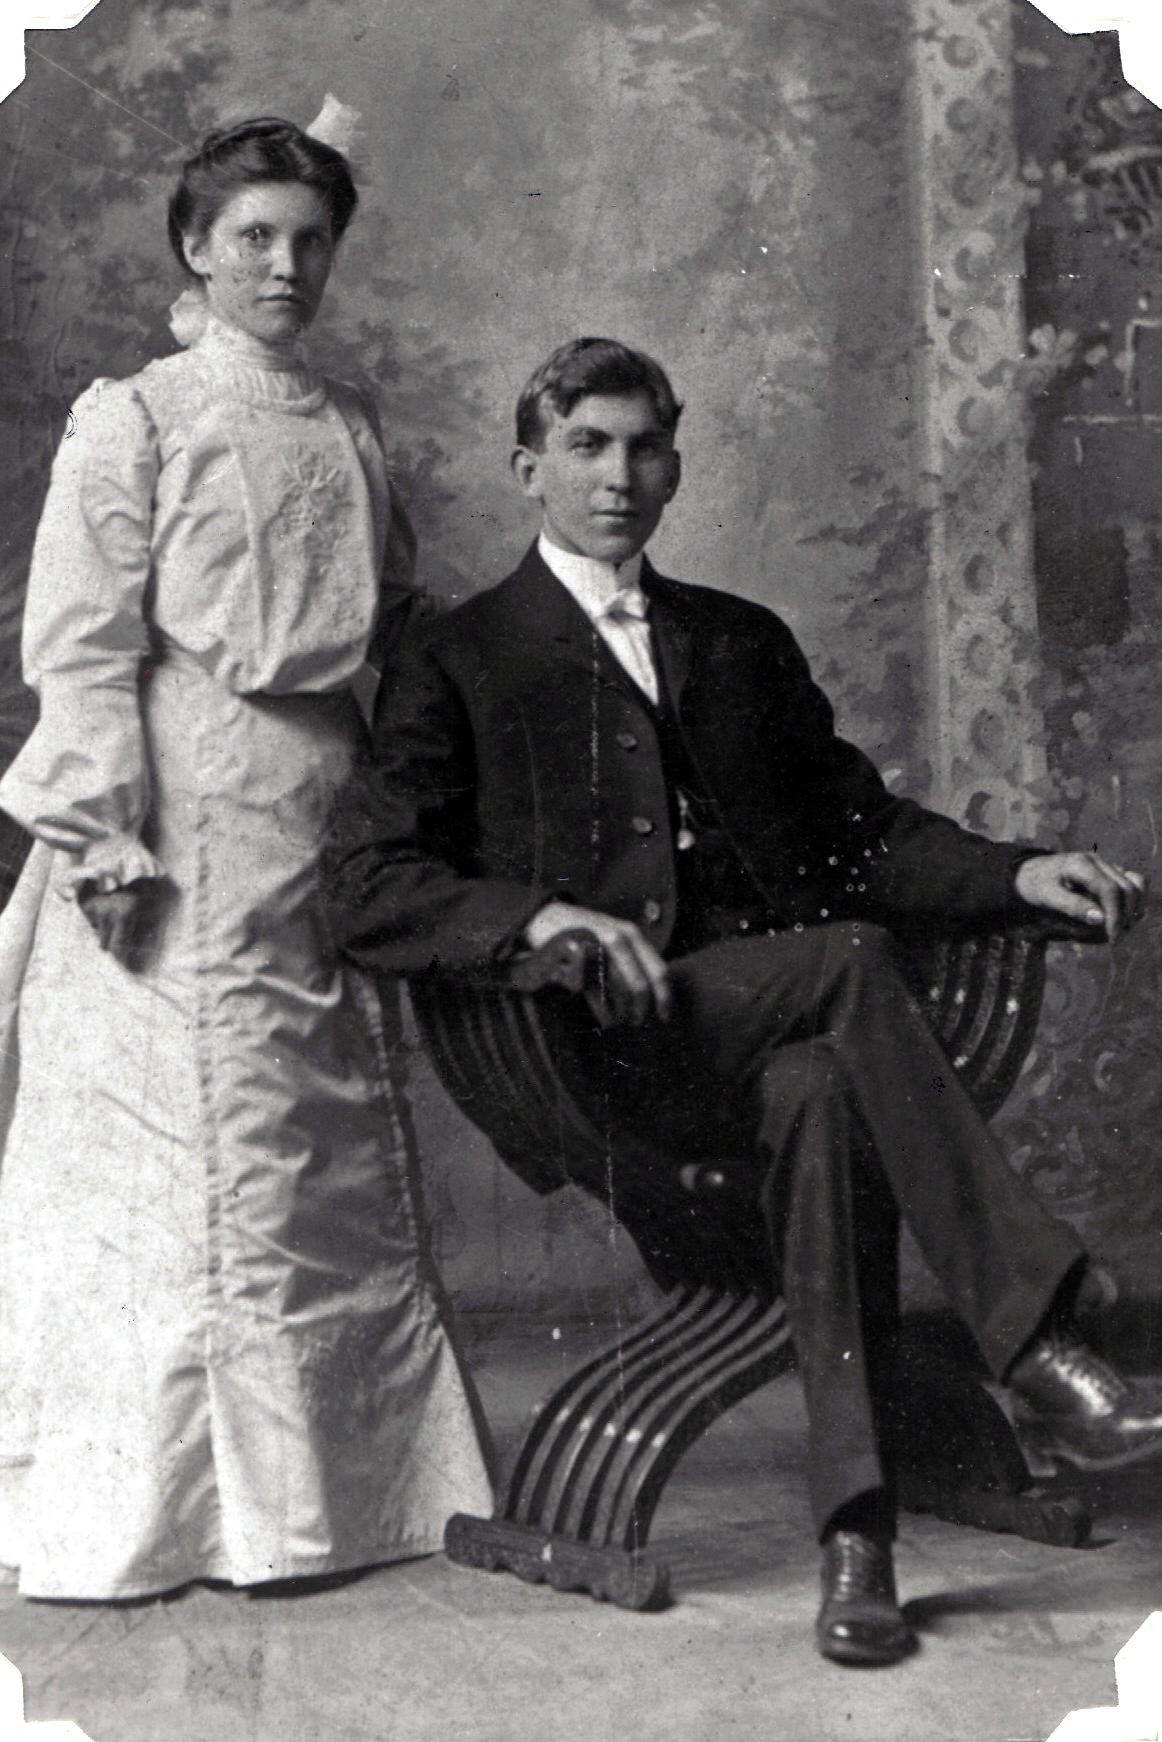 Henry and Anna Honig